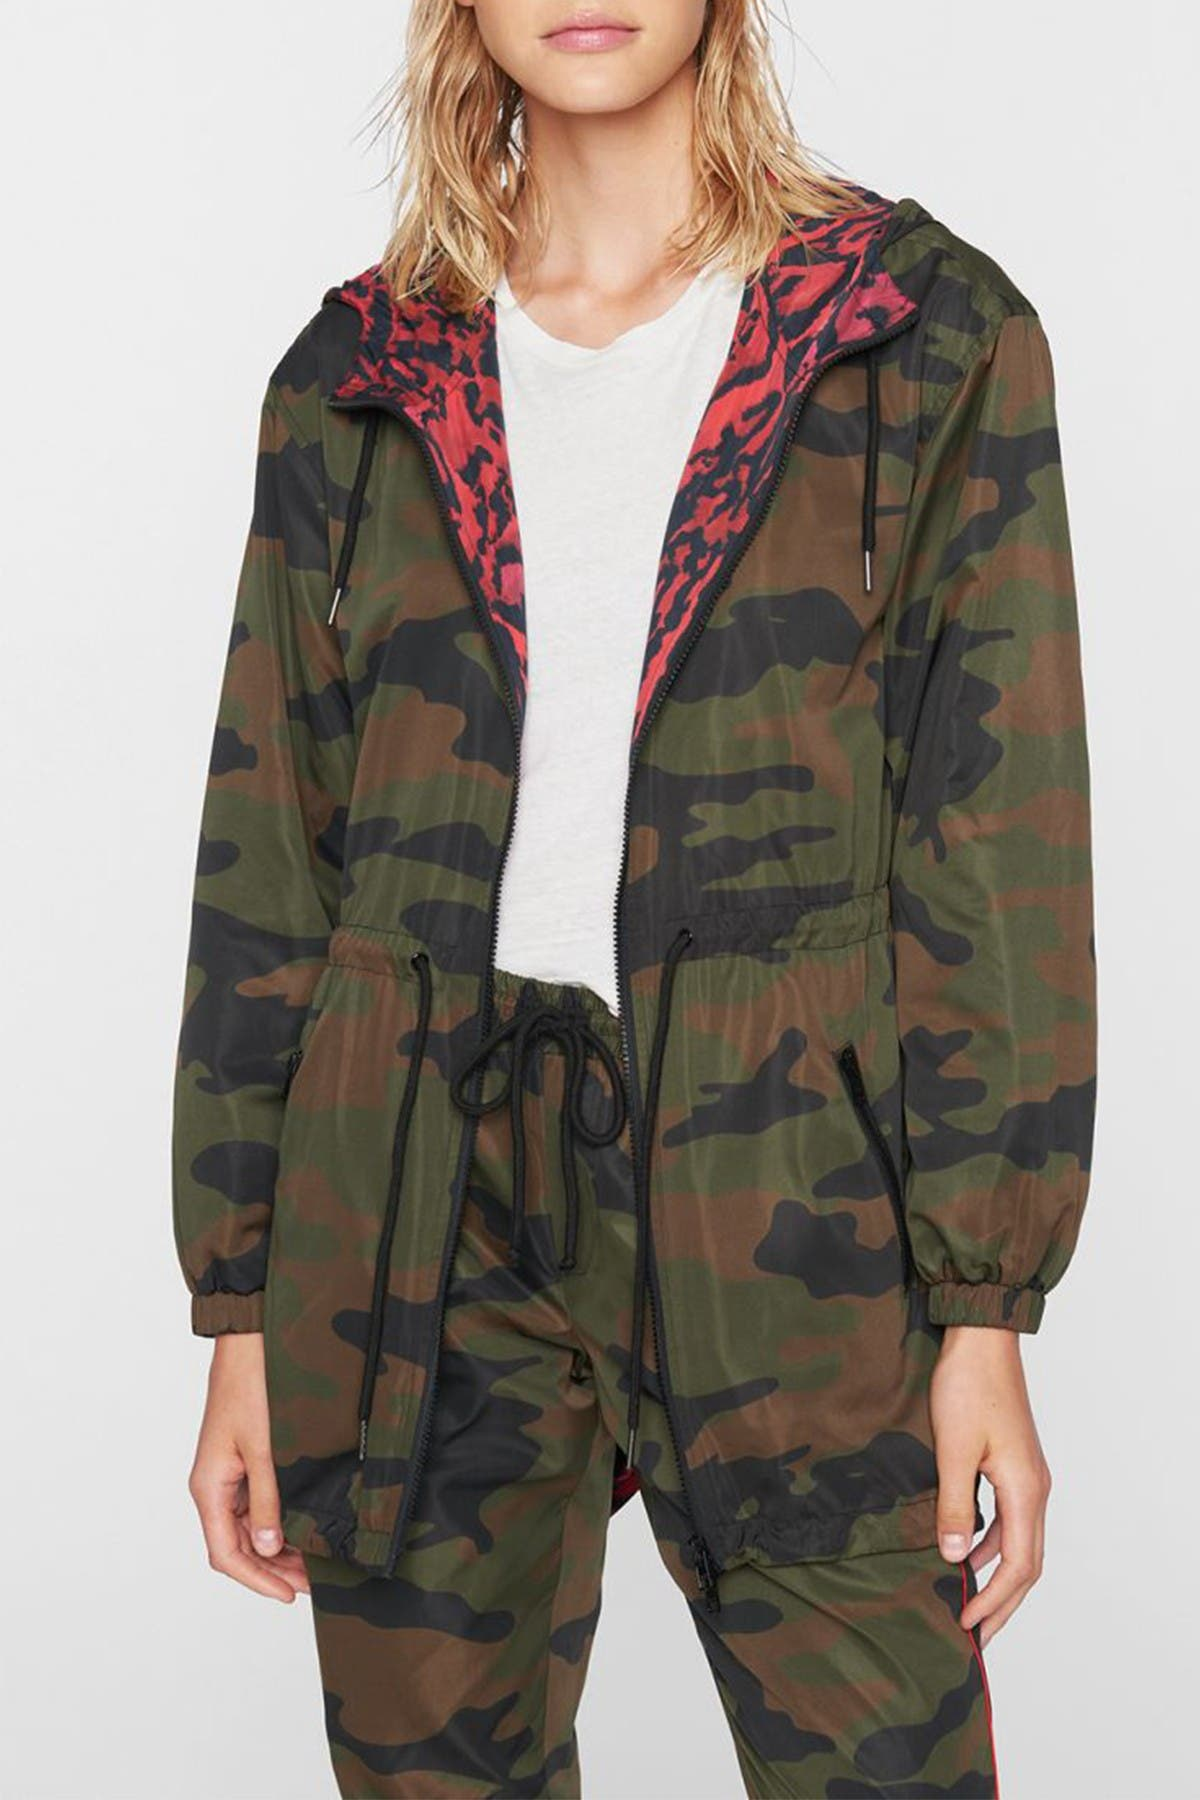 Image of PAM AND GELA Camo Animal Print Reversible Hooded Anorak Jacket